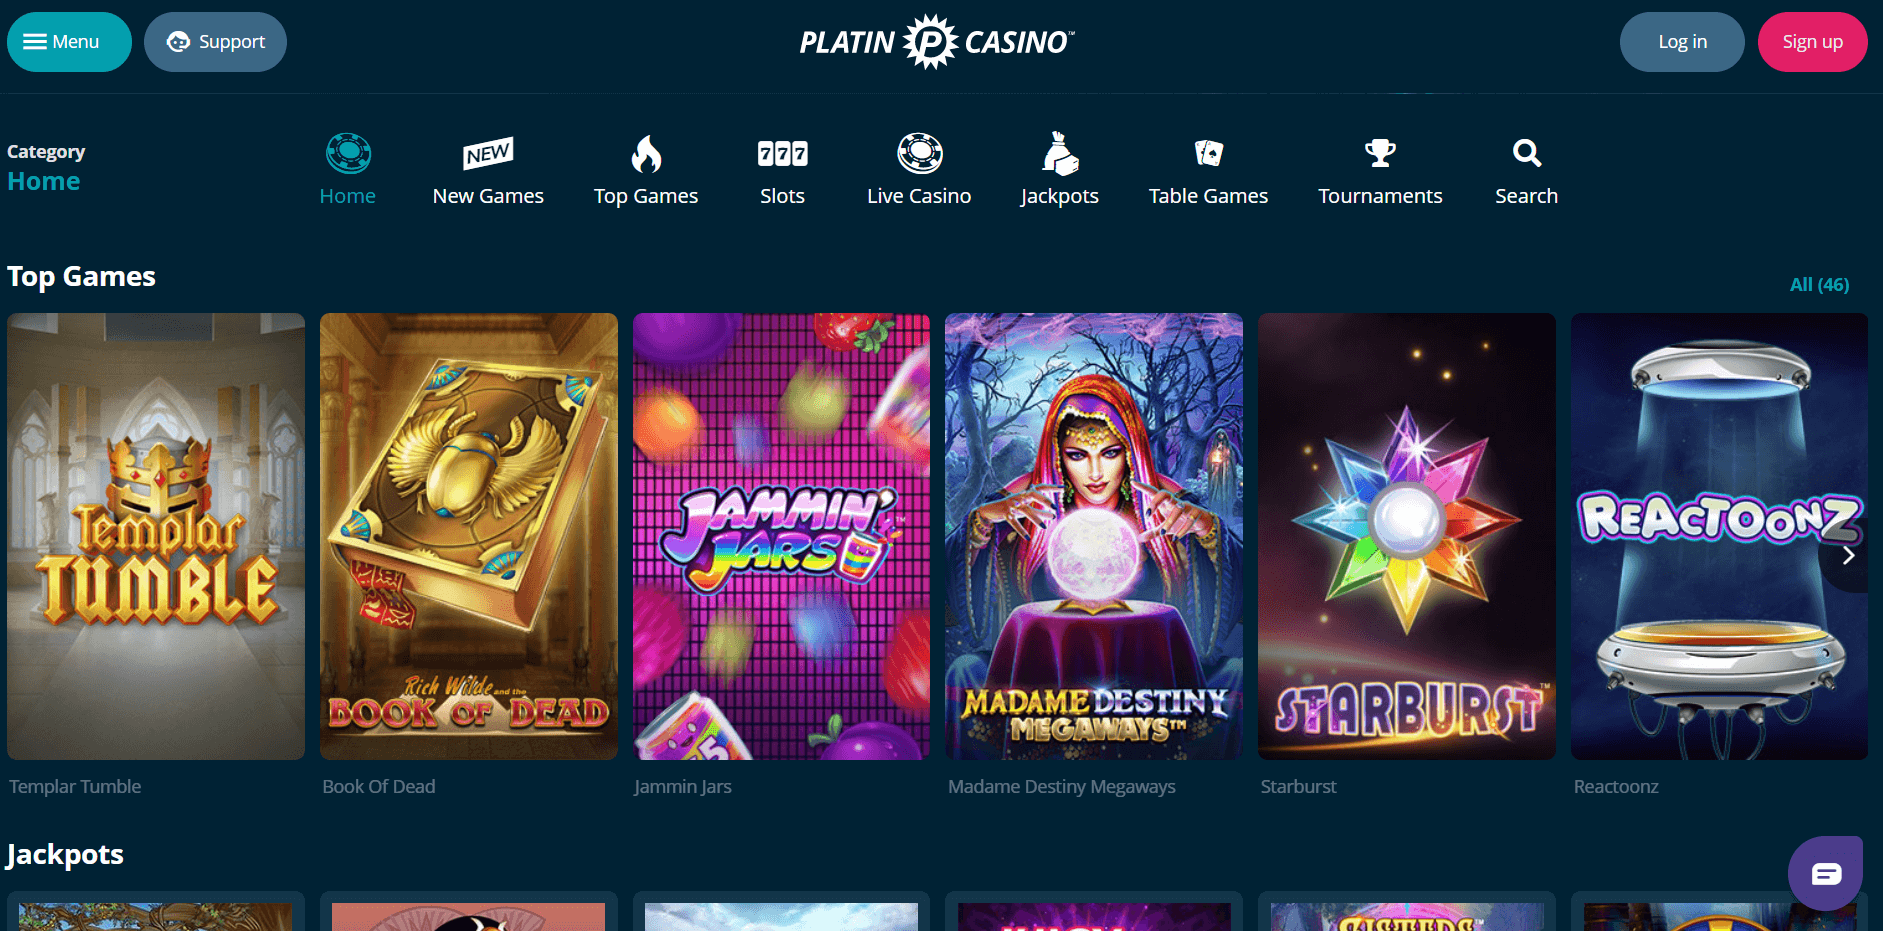 Platincasino slot games